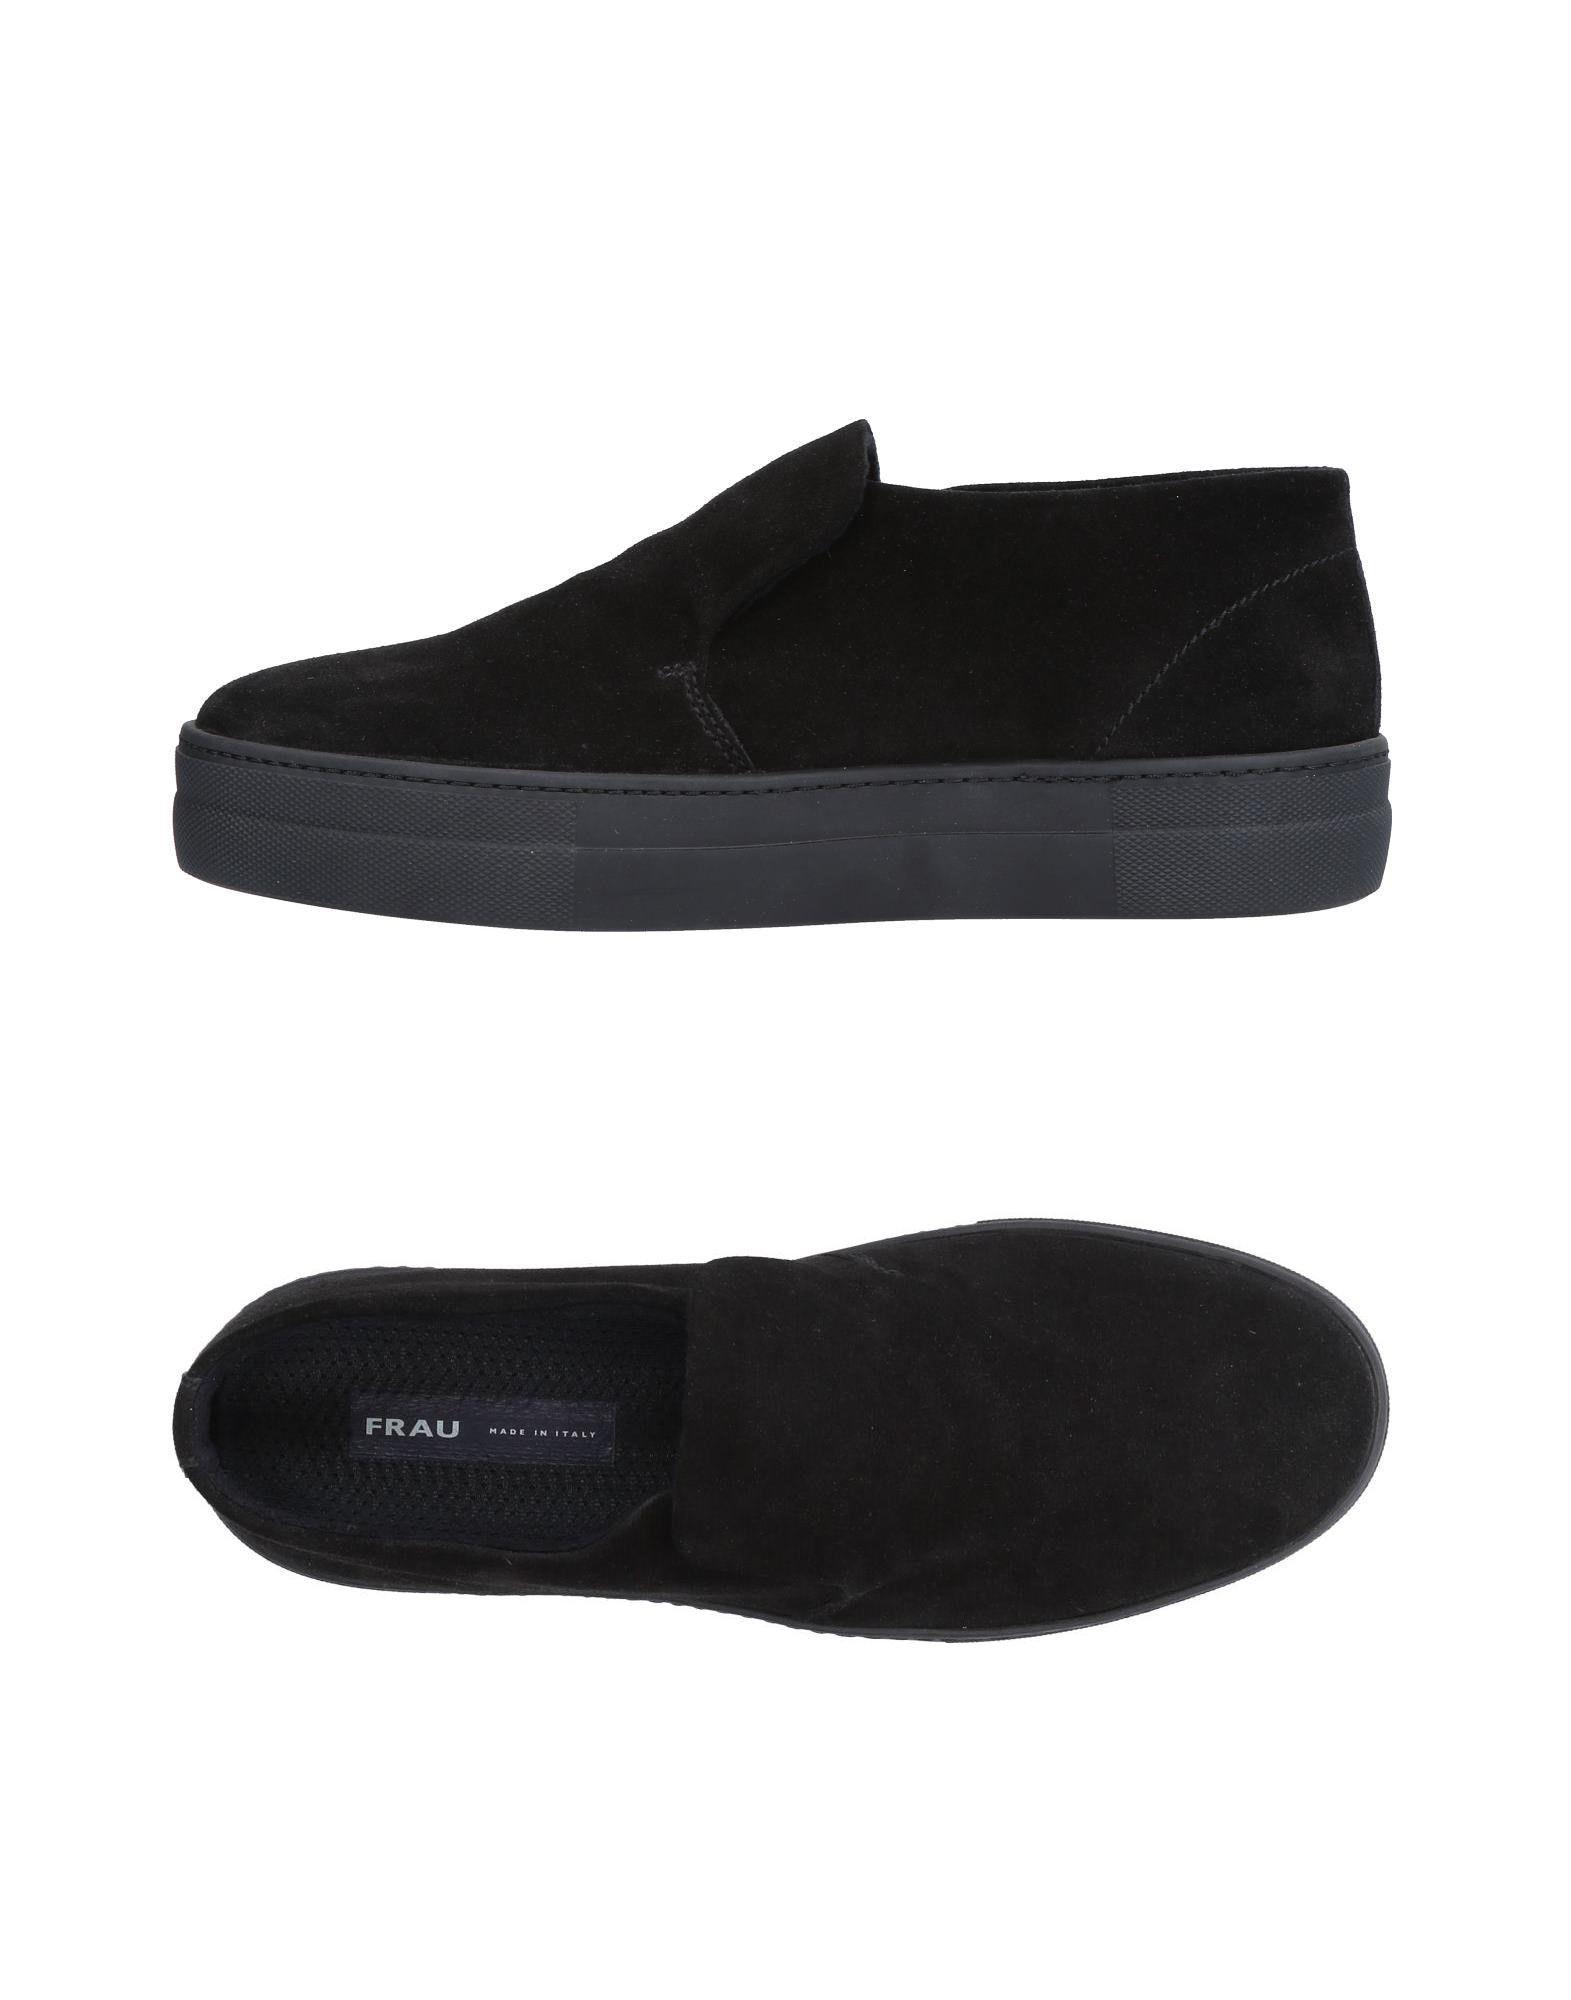 A buon mercato Sneakers Frau Donna - 11503916EG